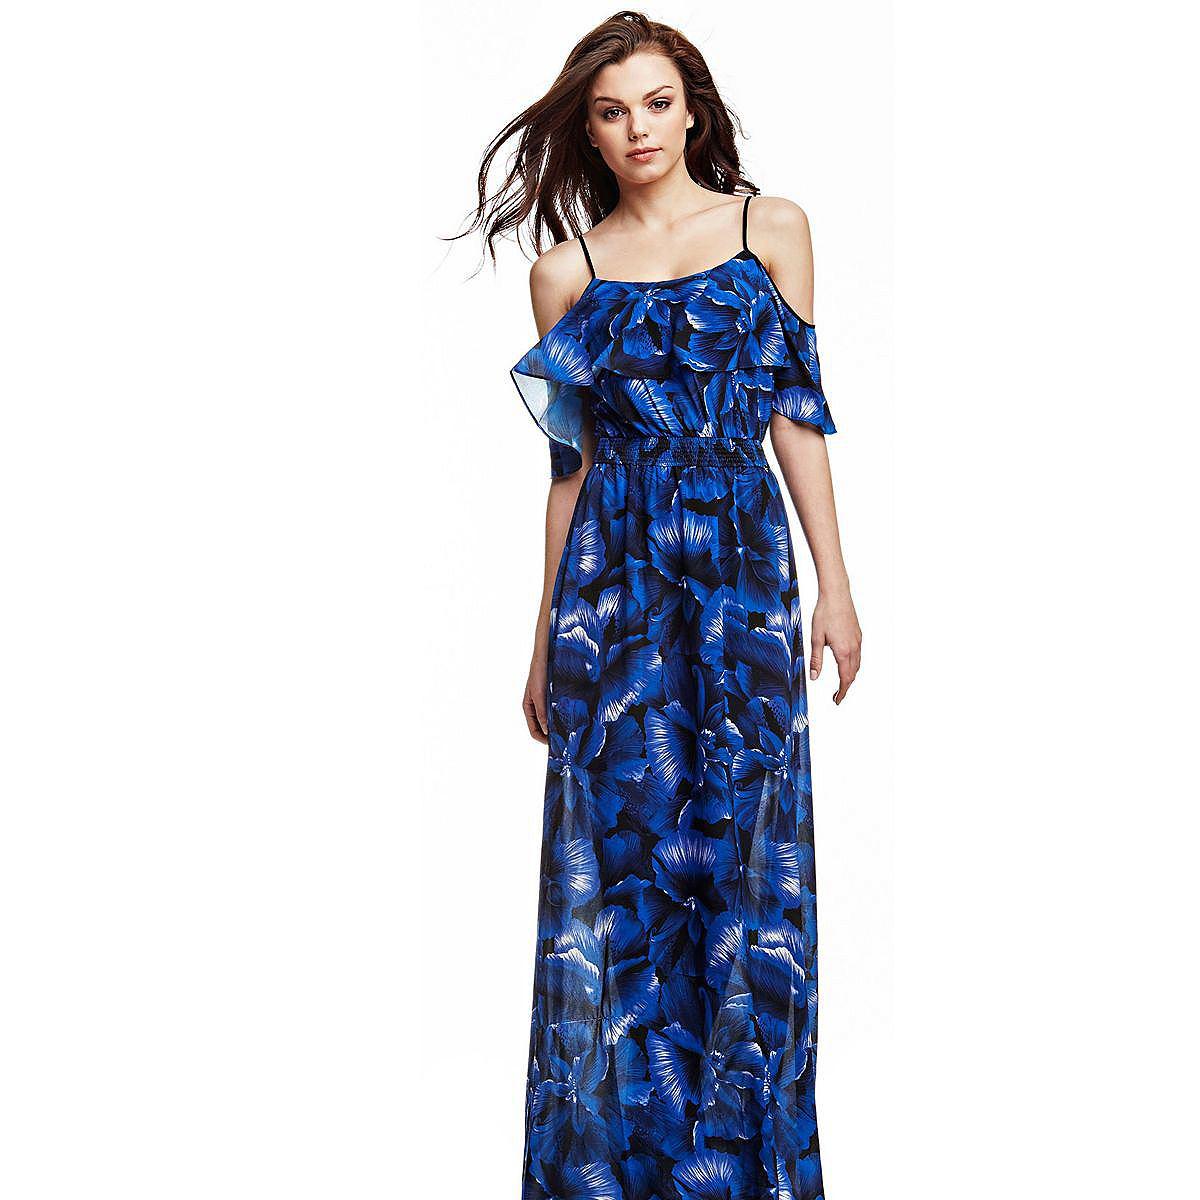 Guess lange jurk met bloemenprint blauw